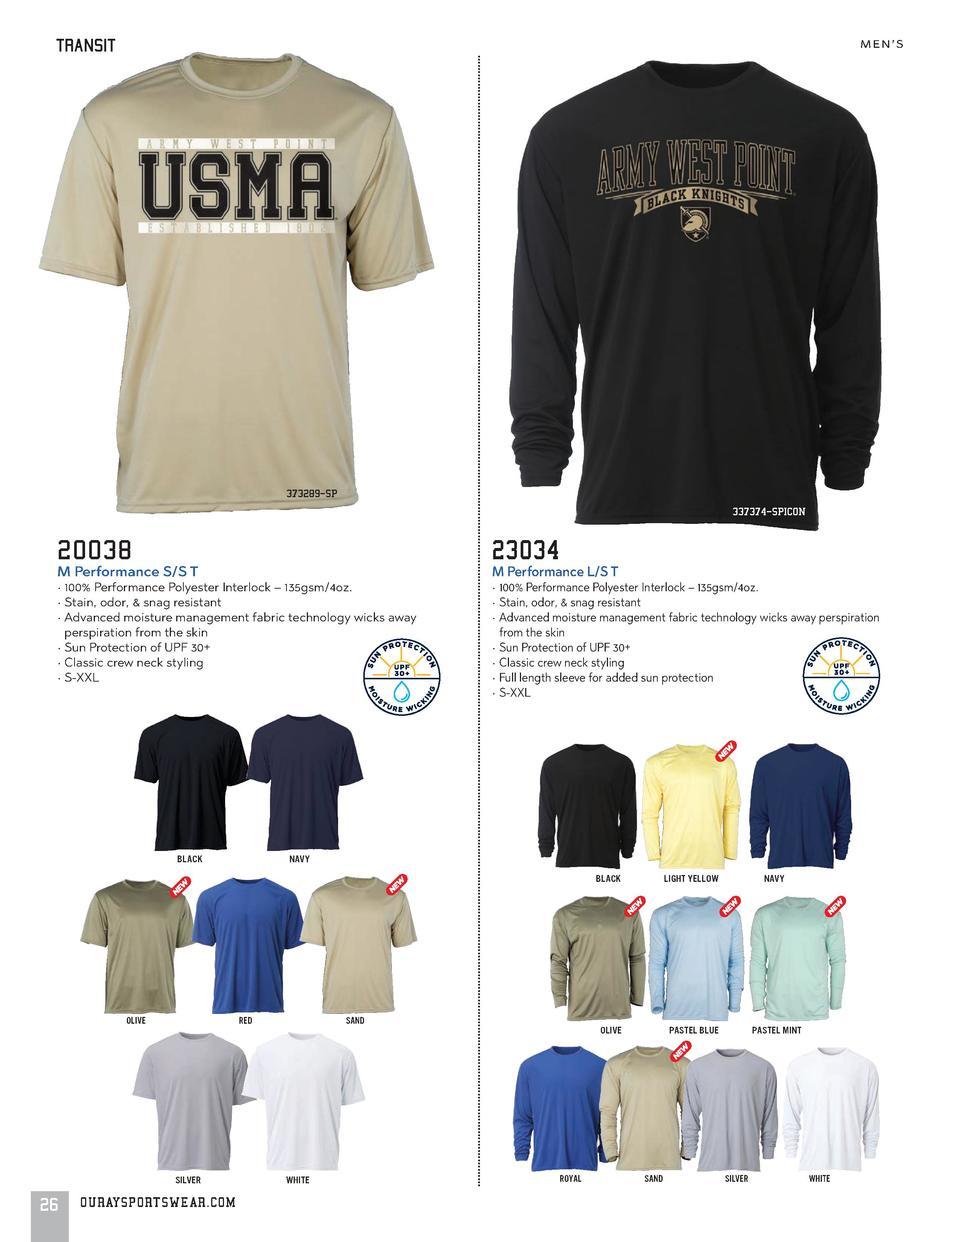 Ouray Sportswear NCAA Erwachsene Herren Vintage Sheer S//S T